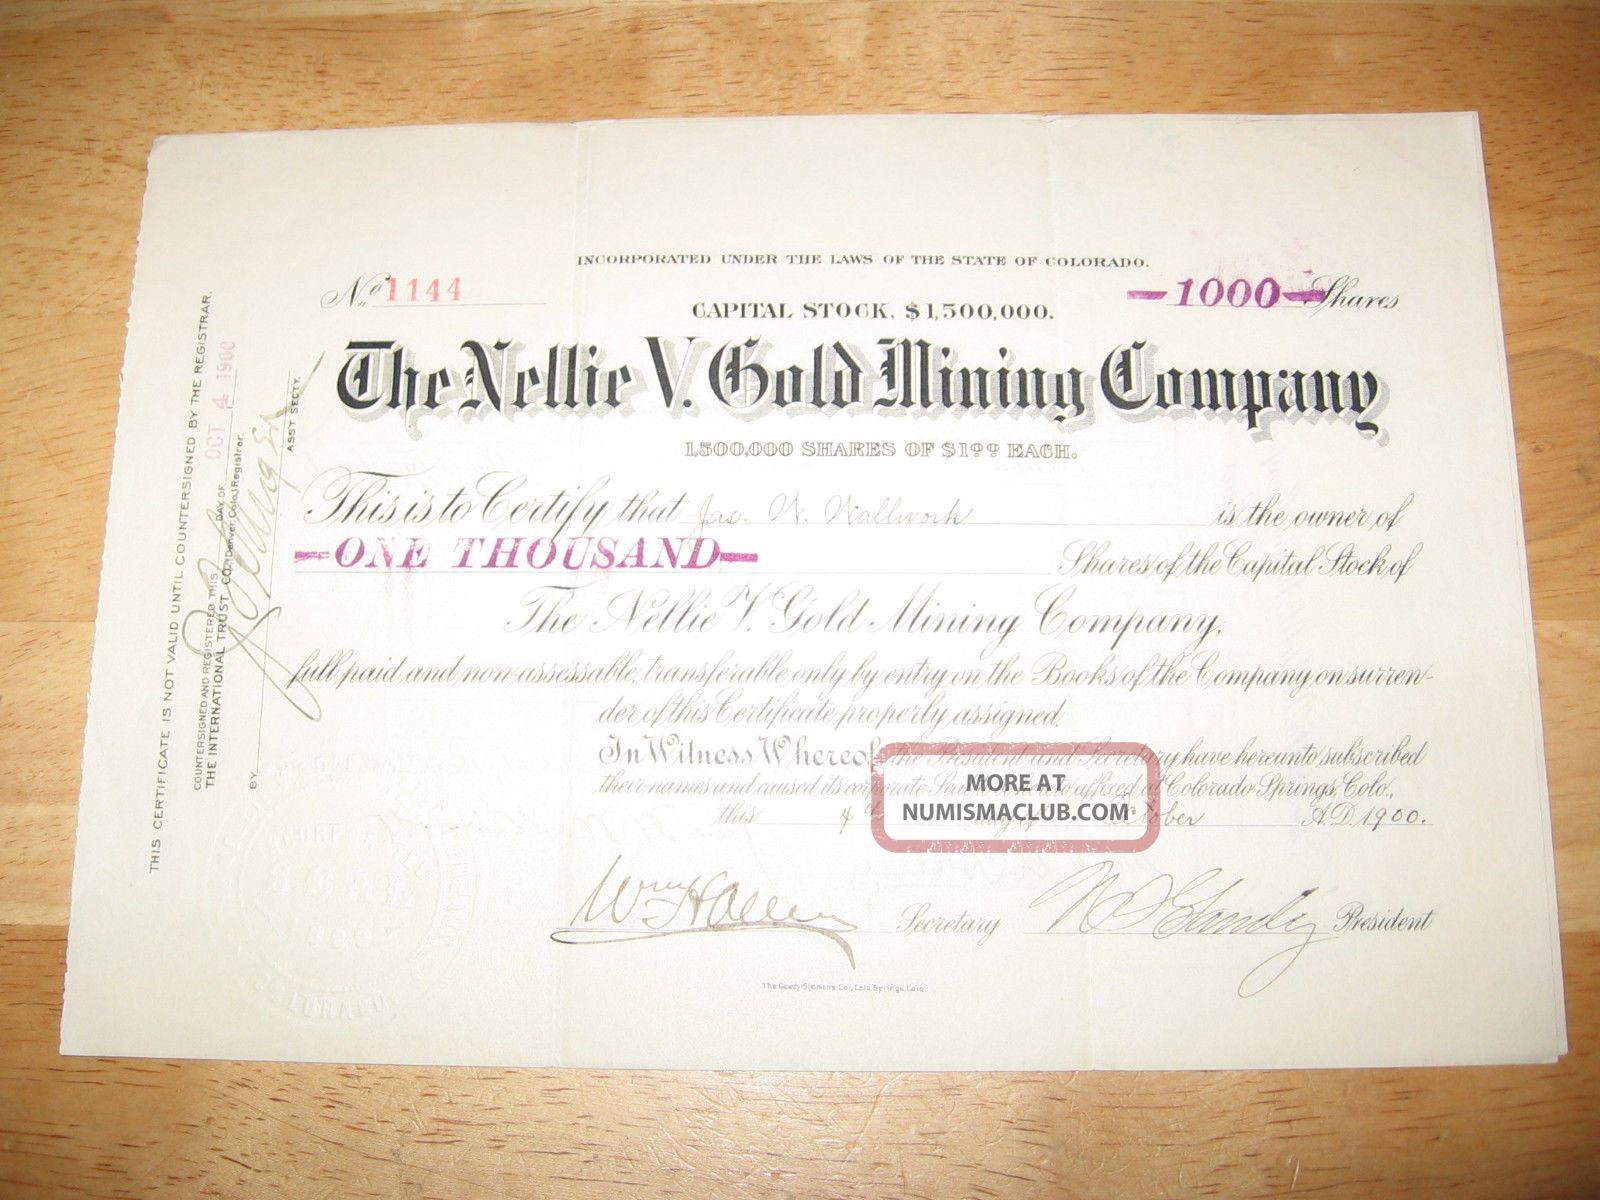 1900 The Nellie V.  Gold Mining Company Stock Certificate Stocks & Bonds, Scripophily photo